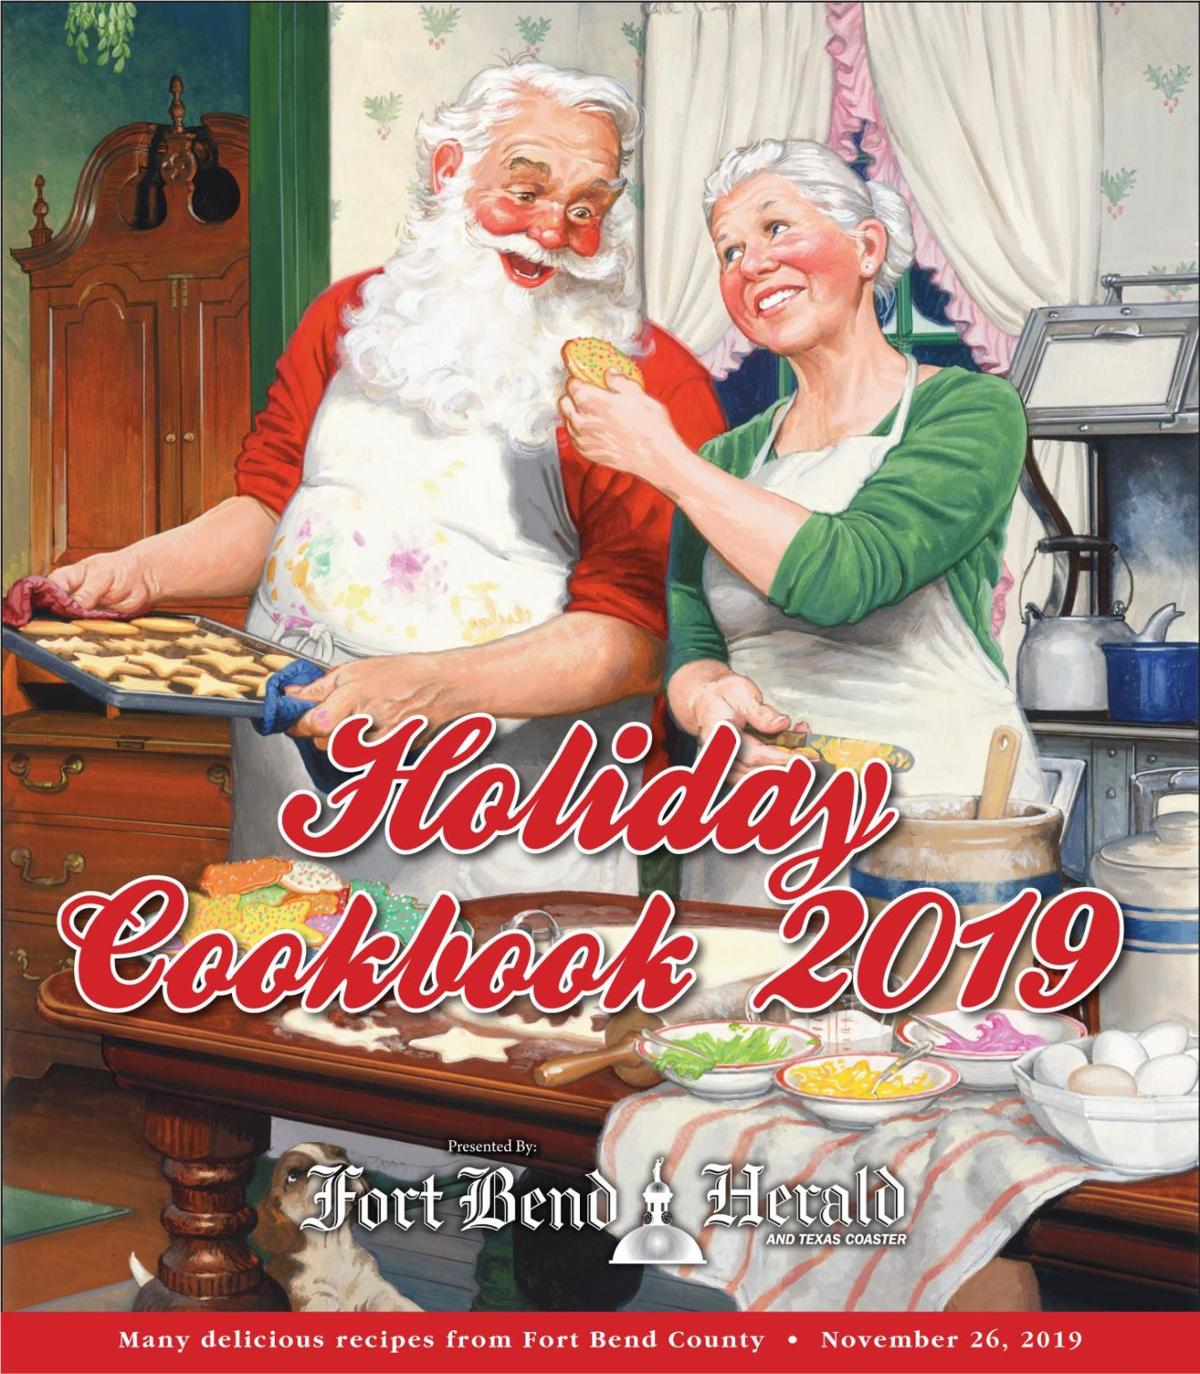 The 2019 Herald Cookbook